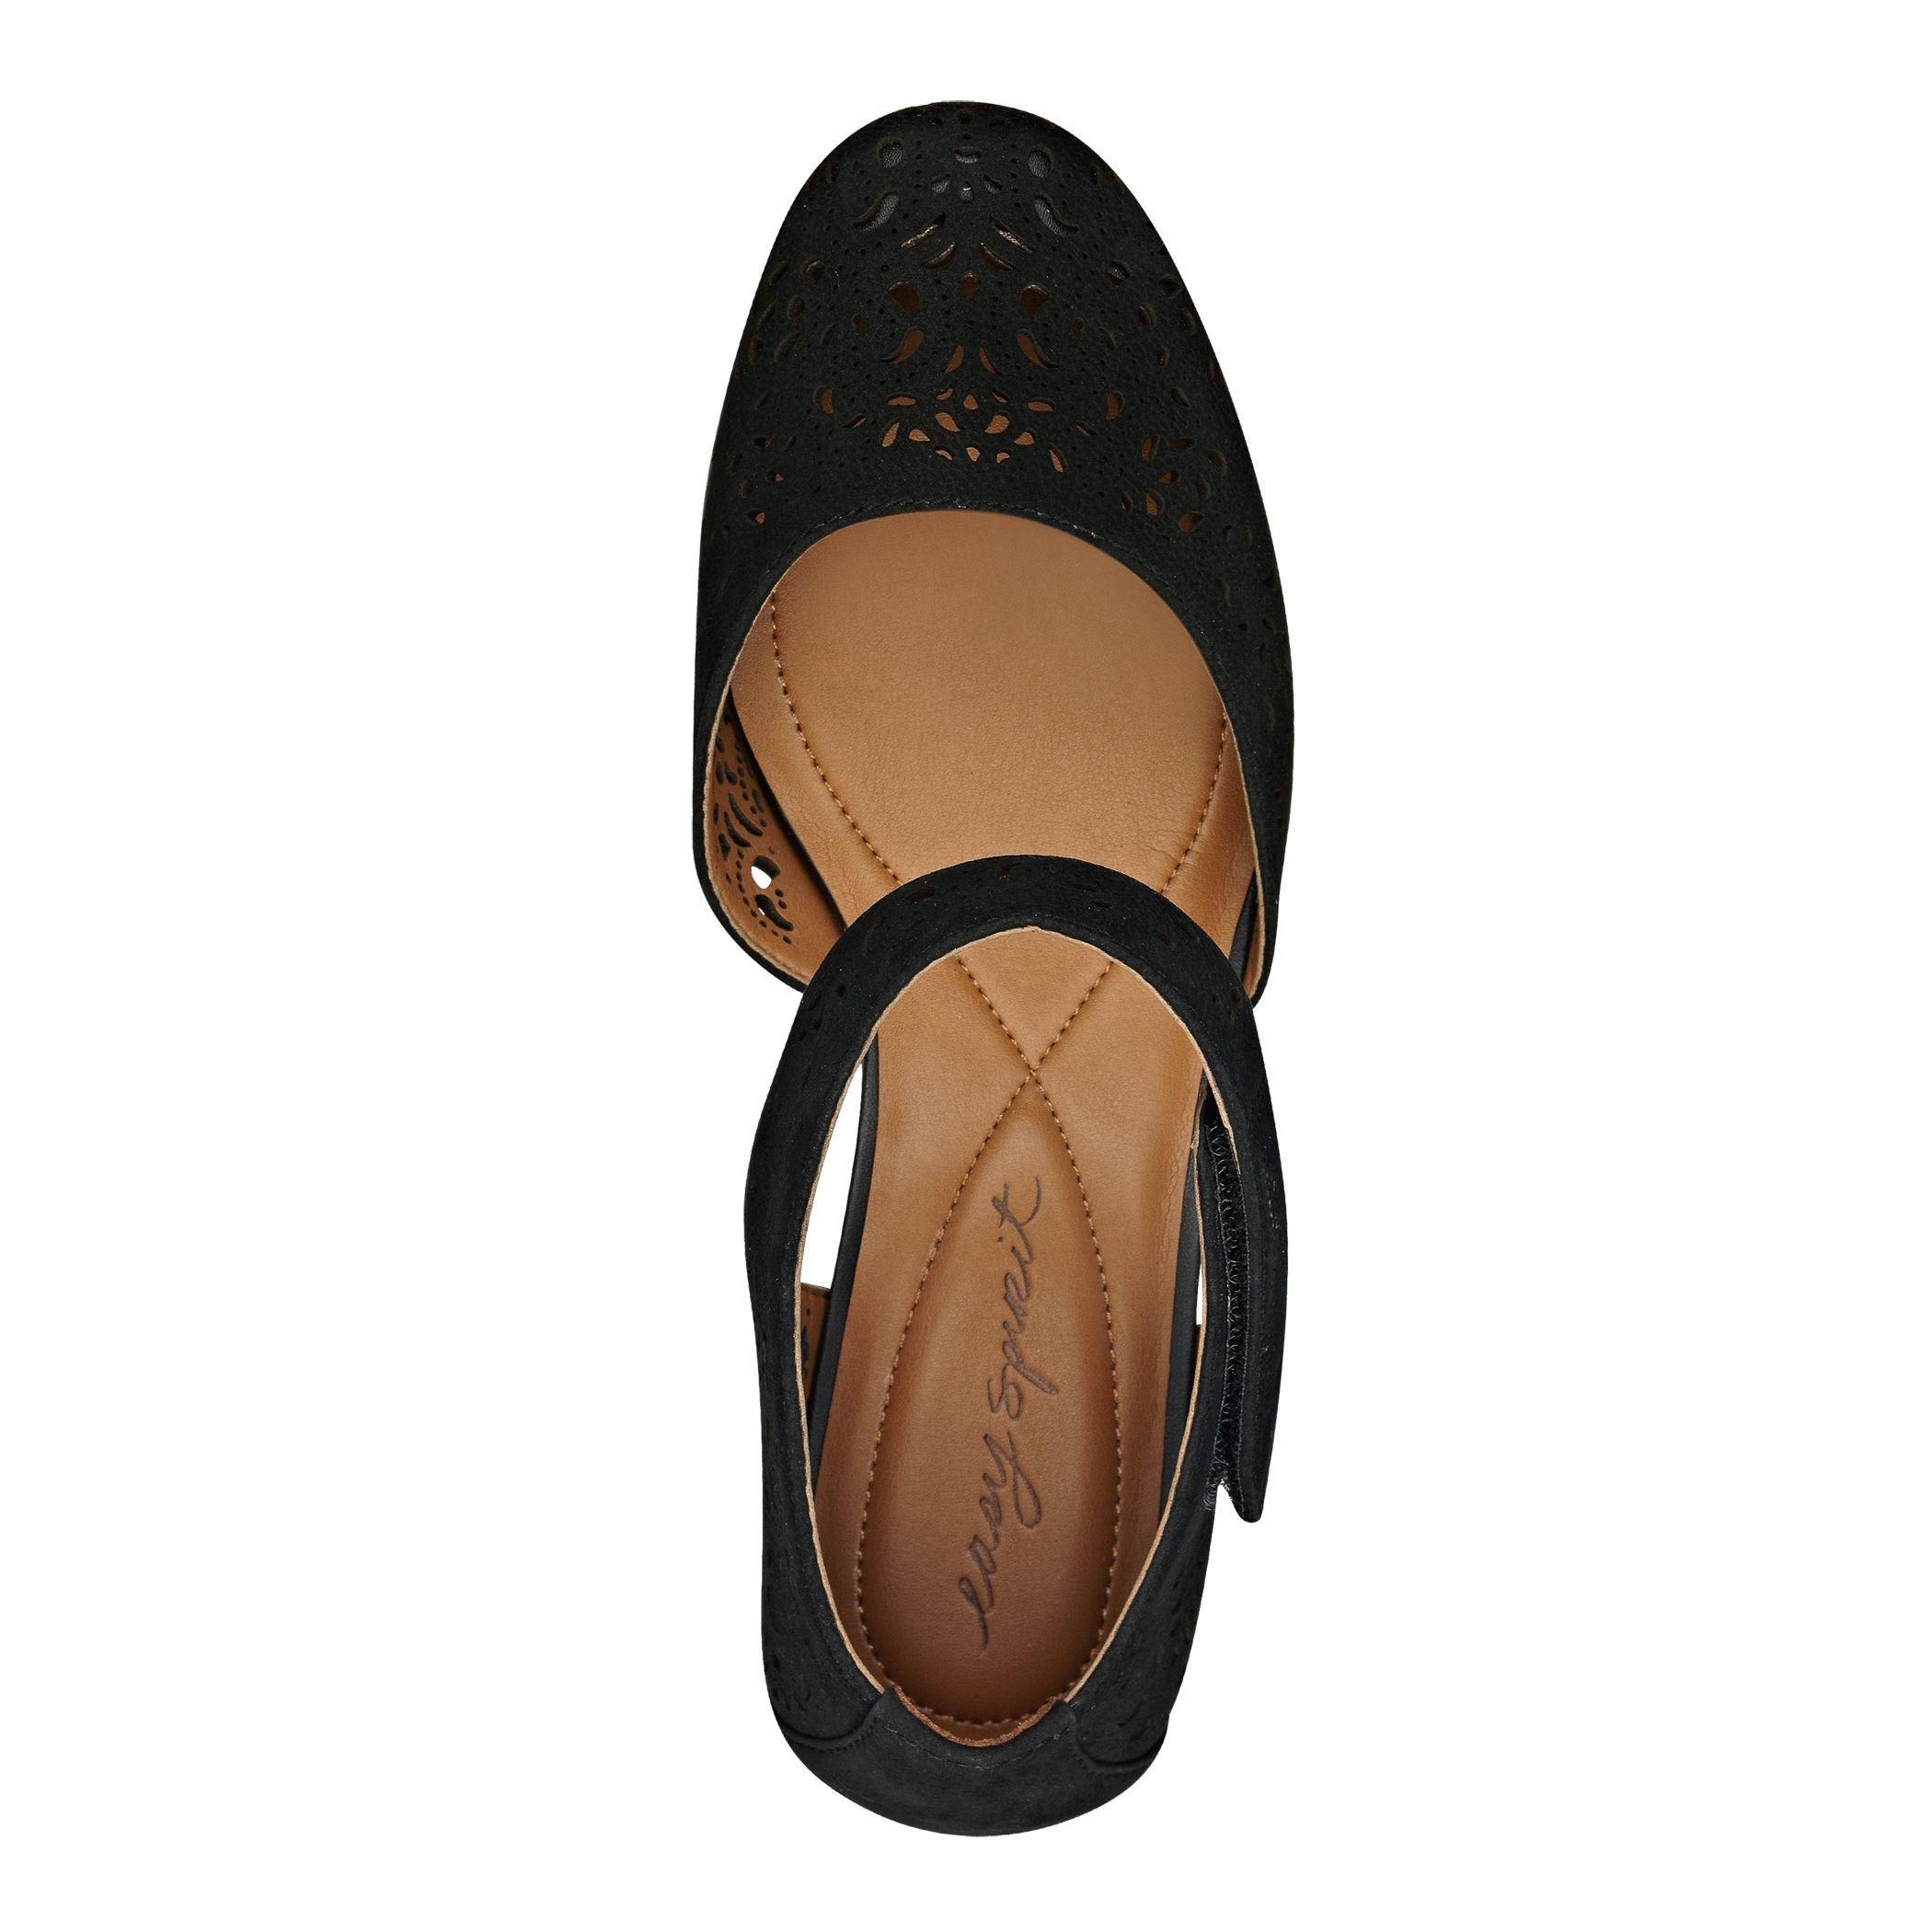 9947e623a465 Easy Spirit - Black Cindie Mary Jane Heels - Lyst. View fullscreen